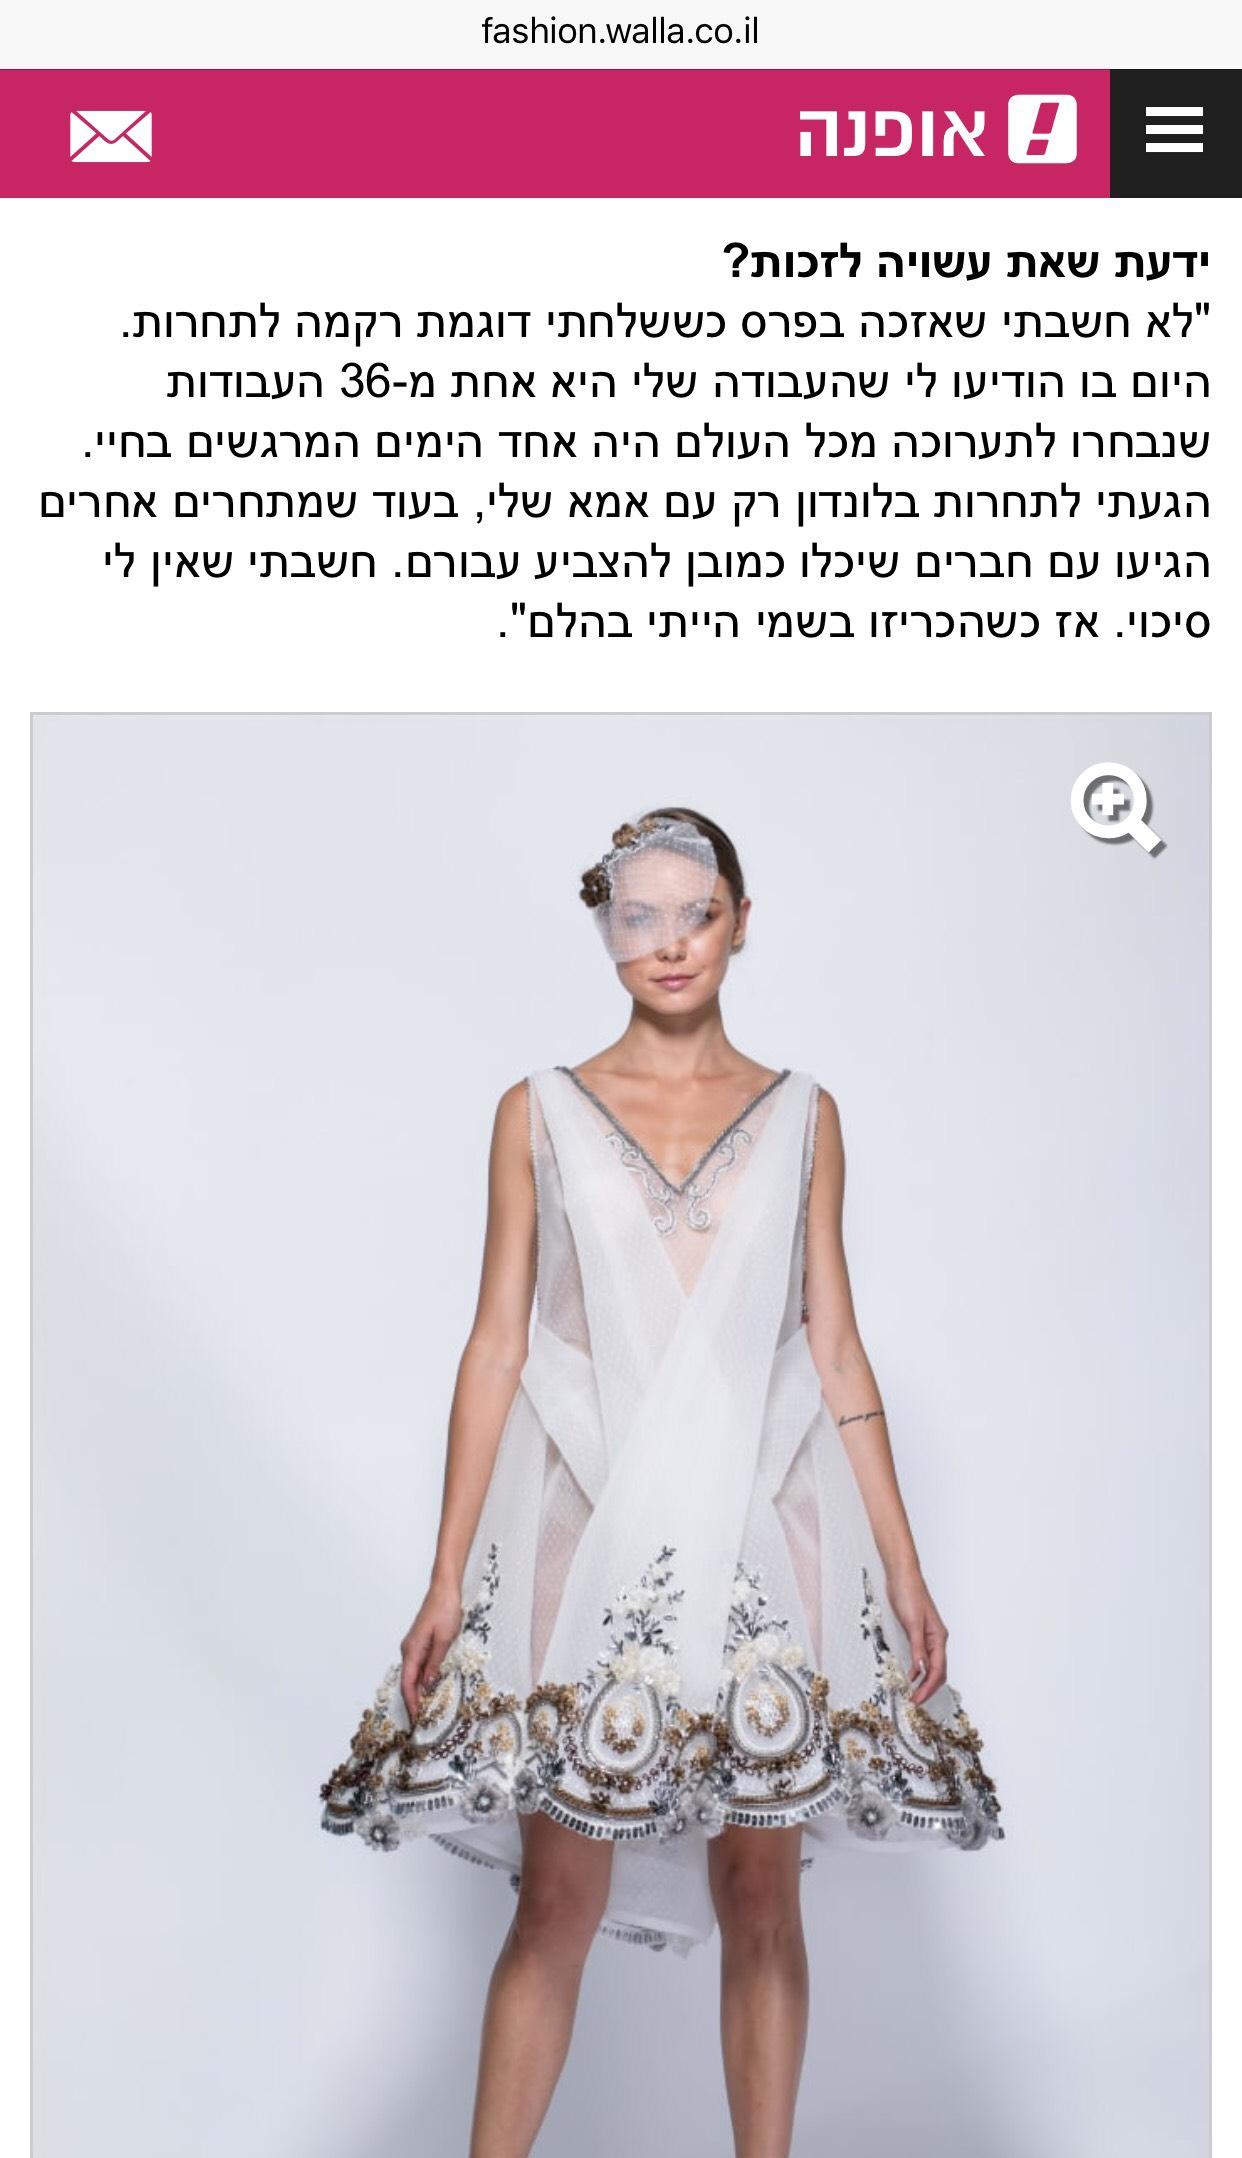 Walla Fashion